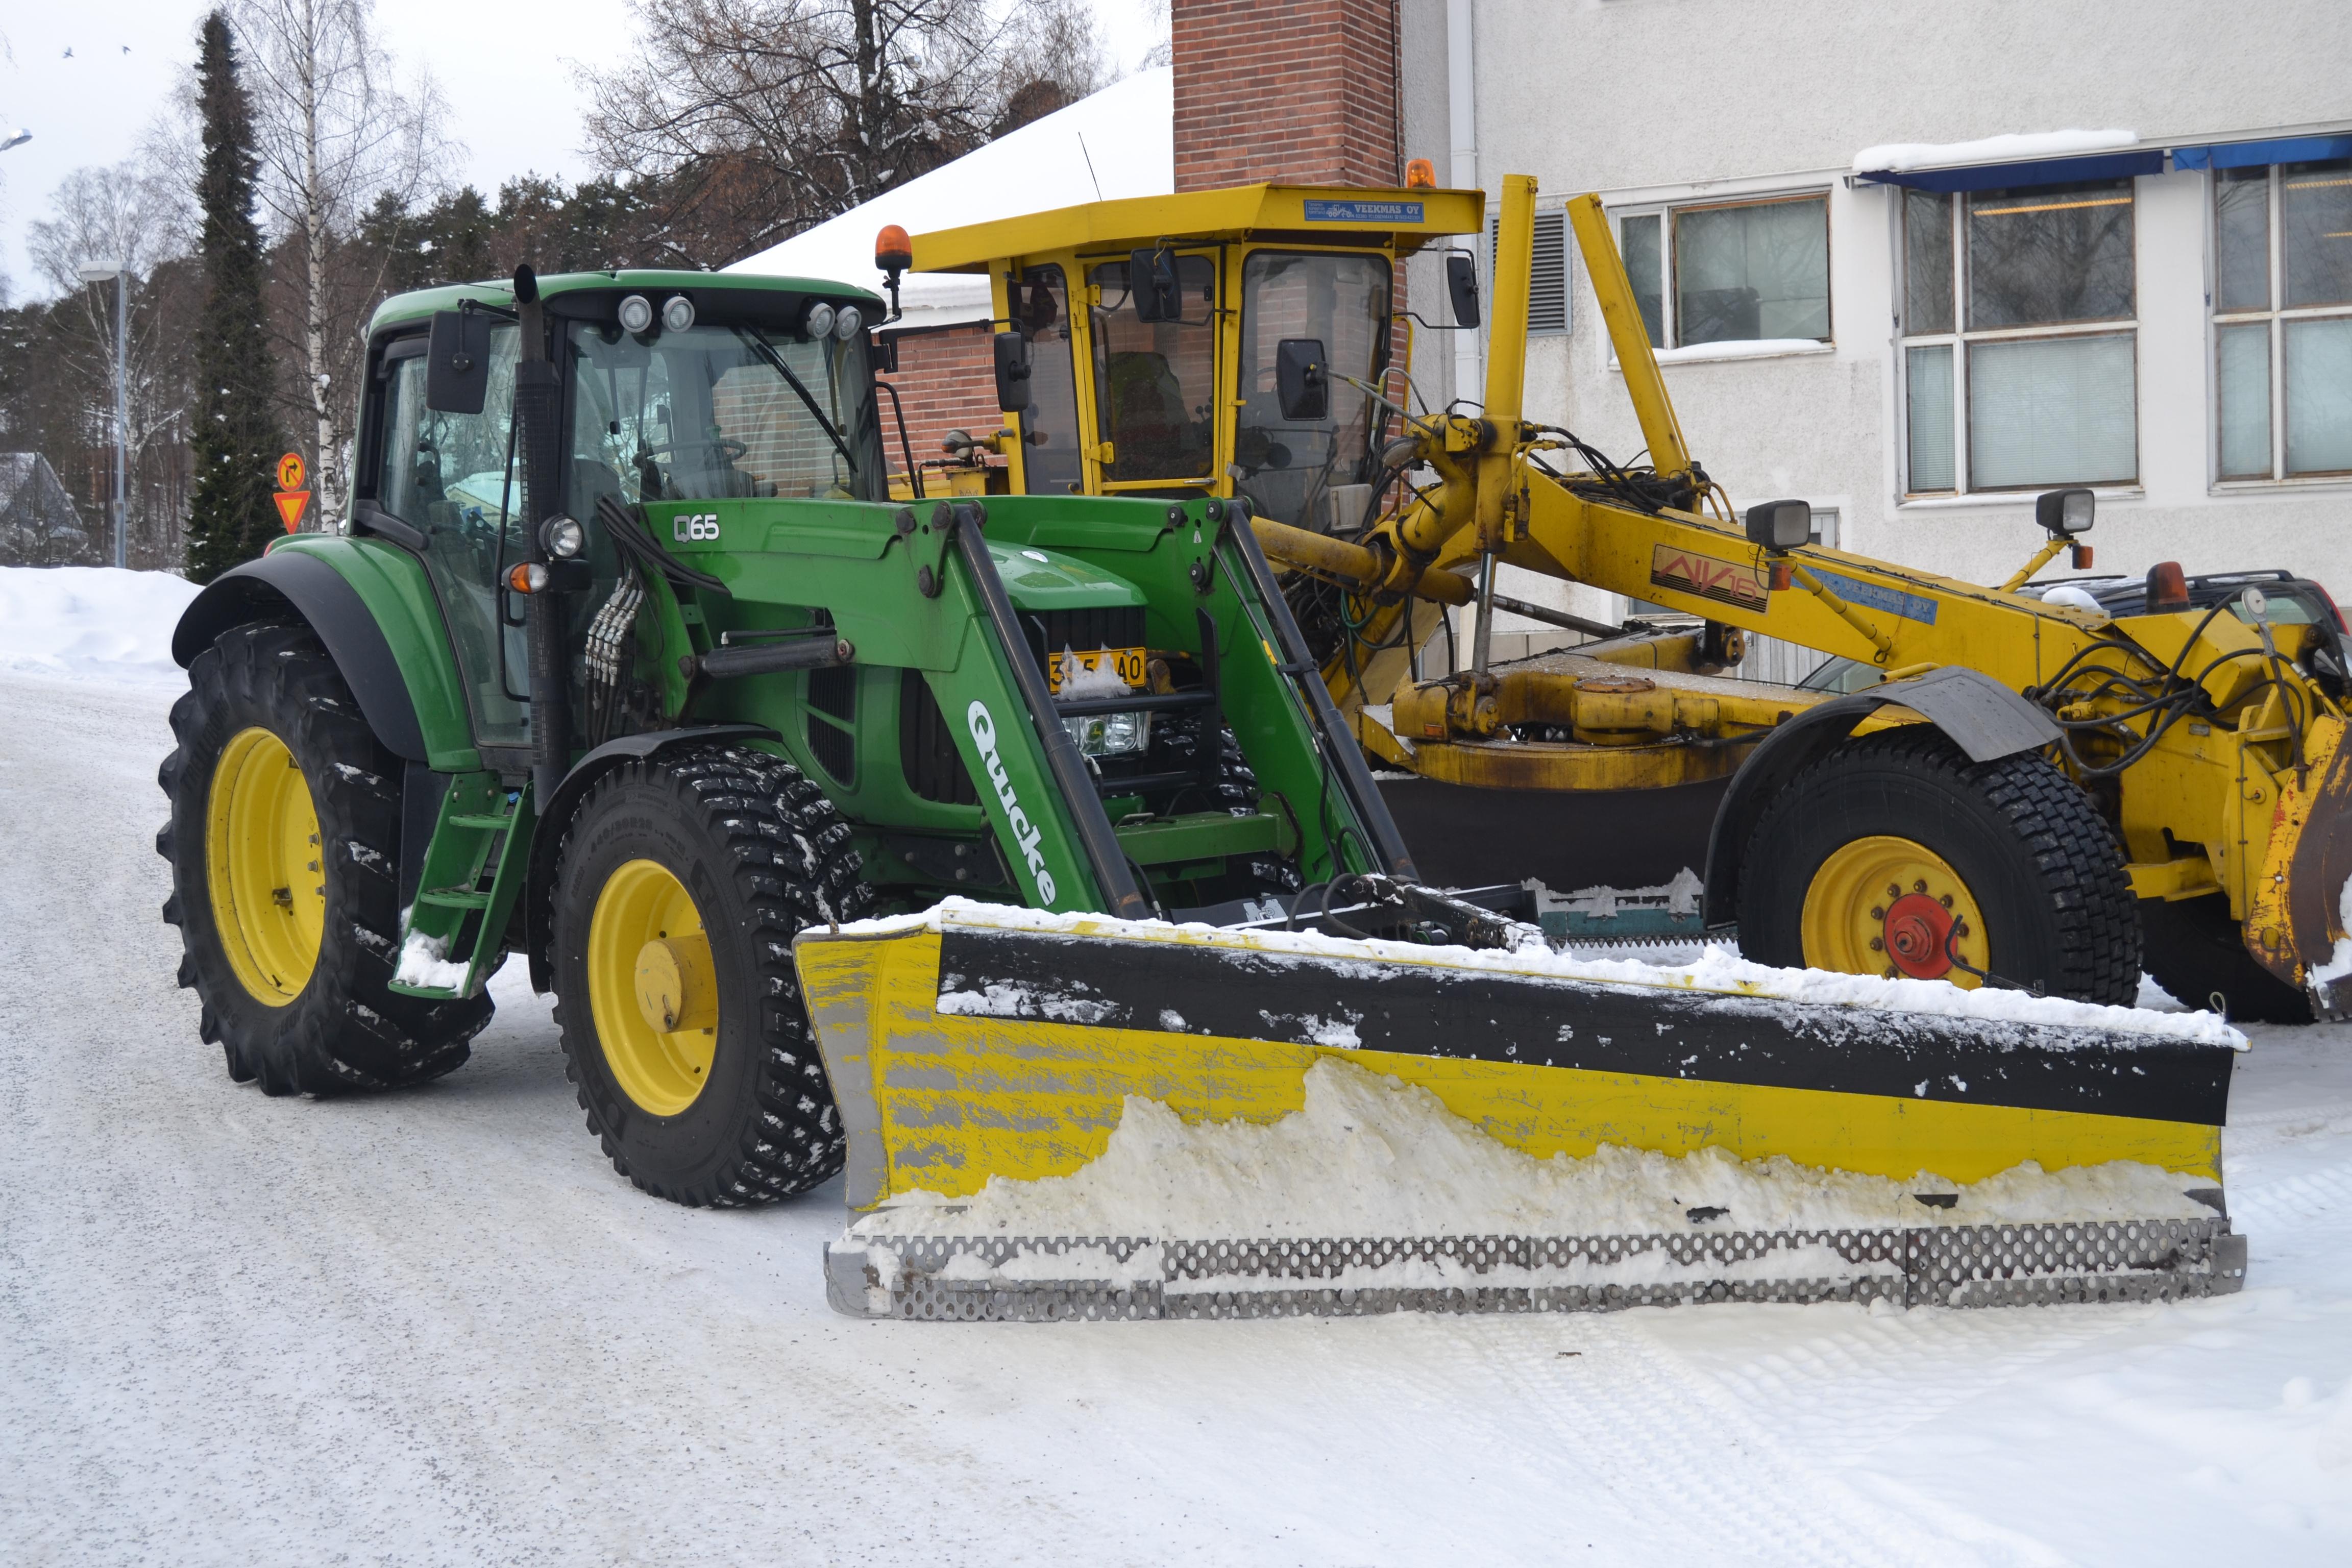 John Deere Gator Plow >> John Deere Snow Plow - Bing images